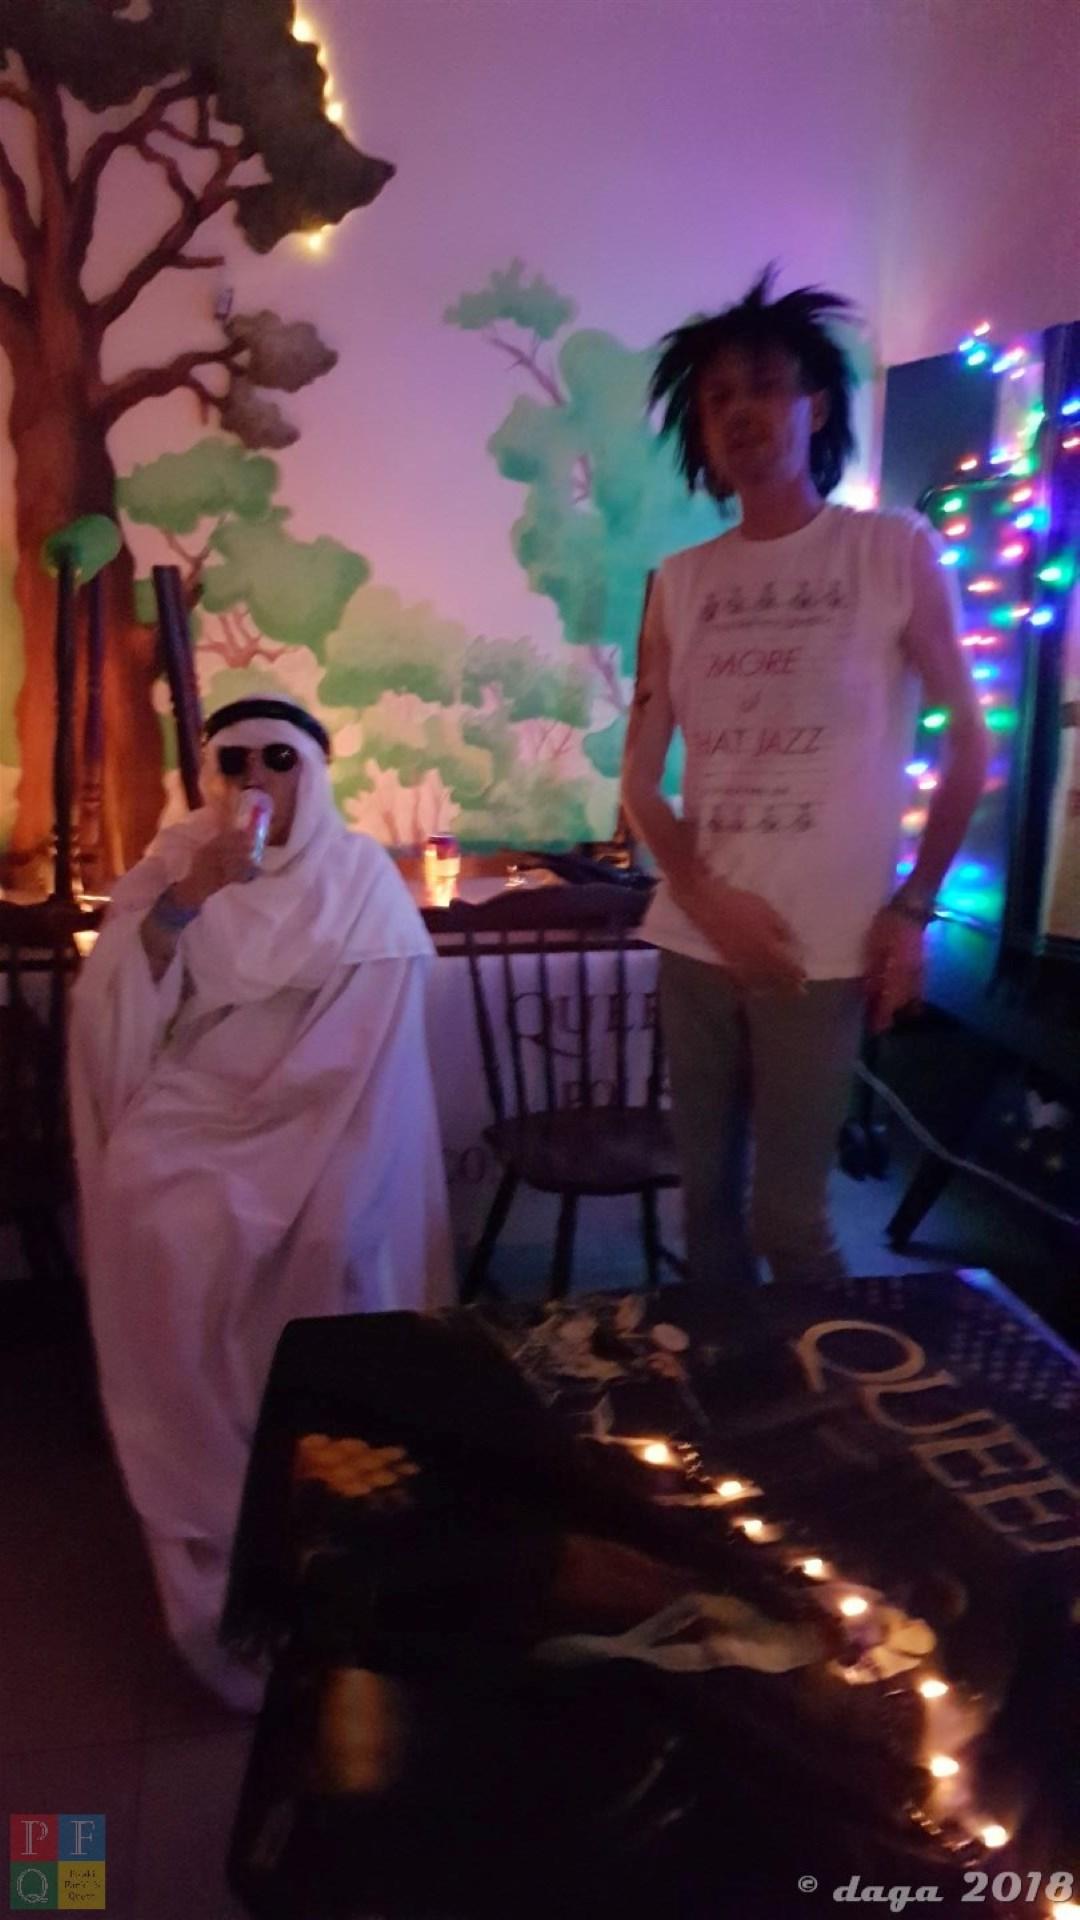 Zlot fanow Queen 2018 daga  - 21